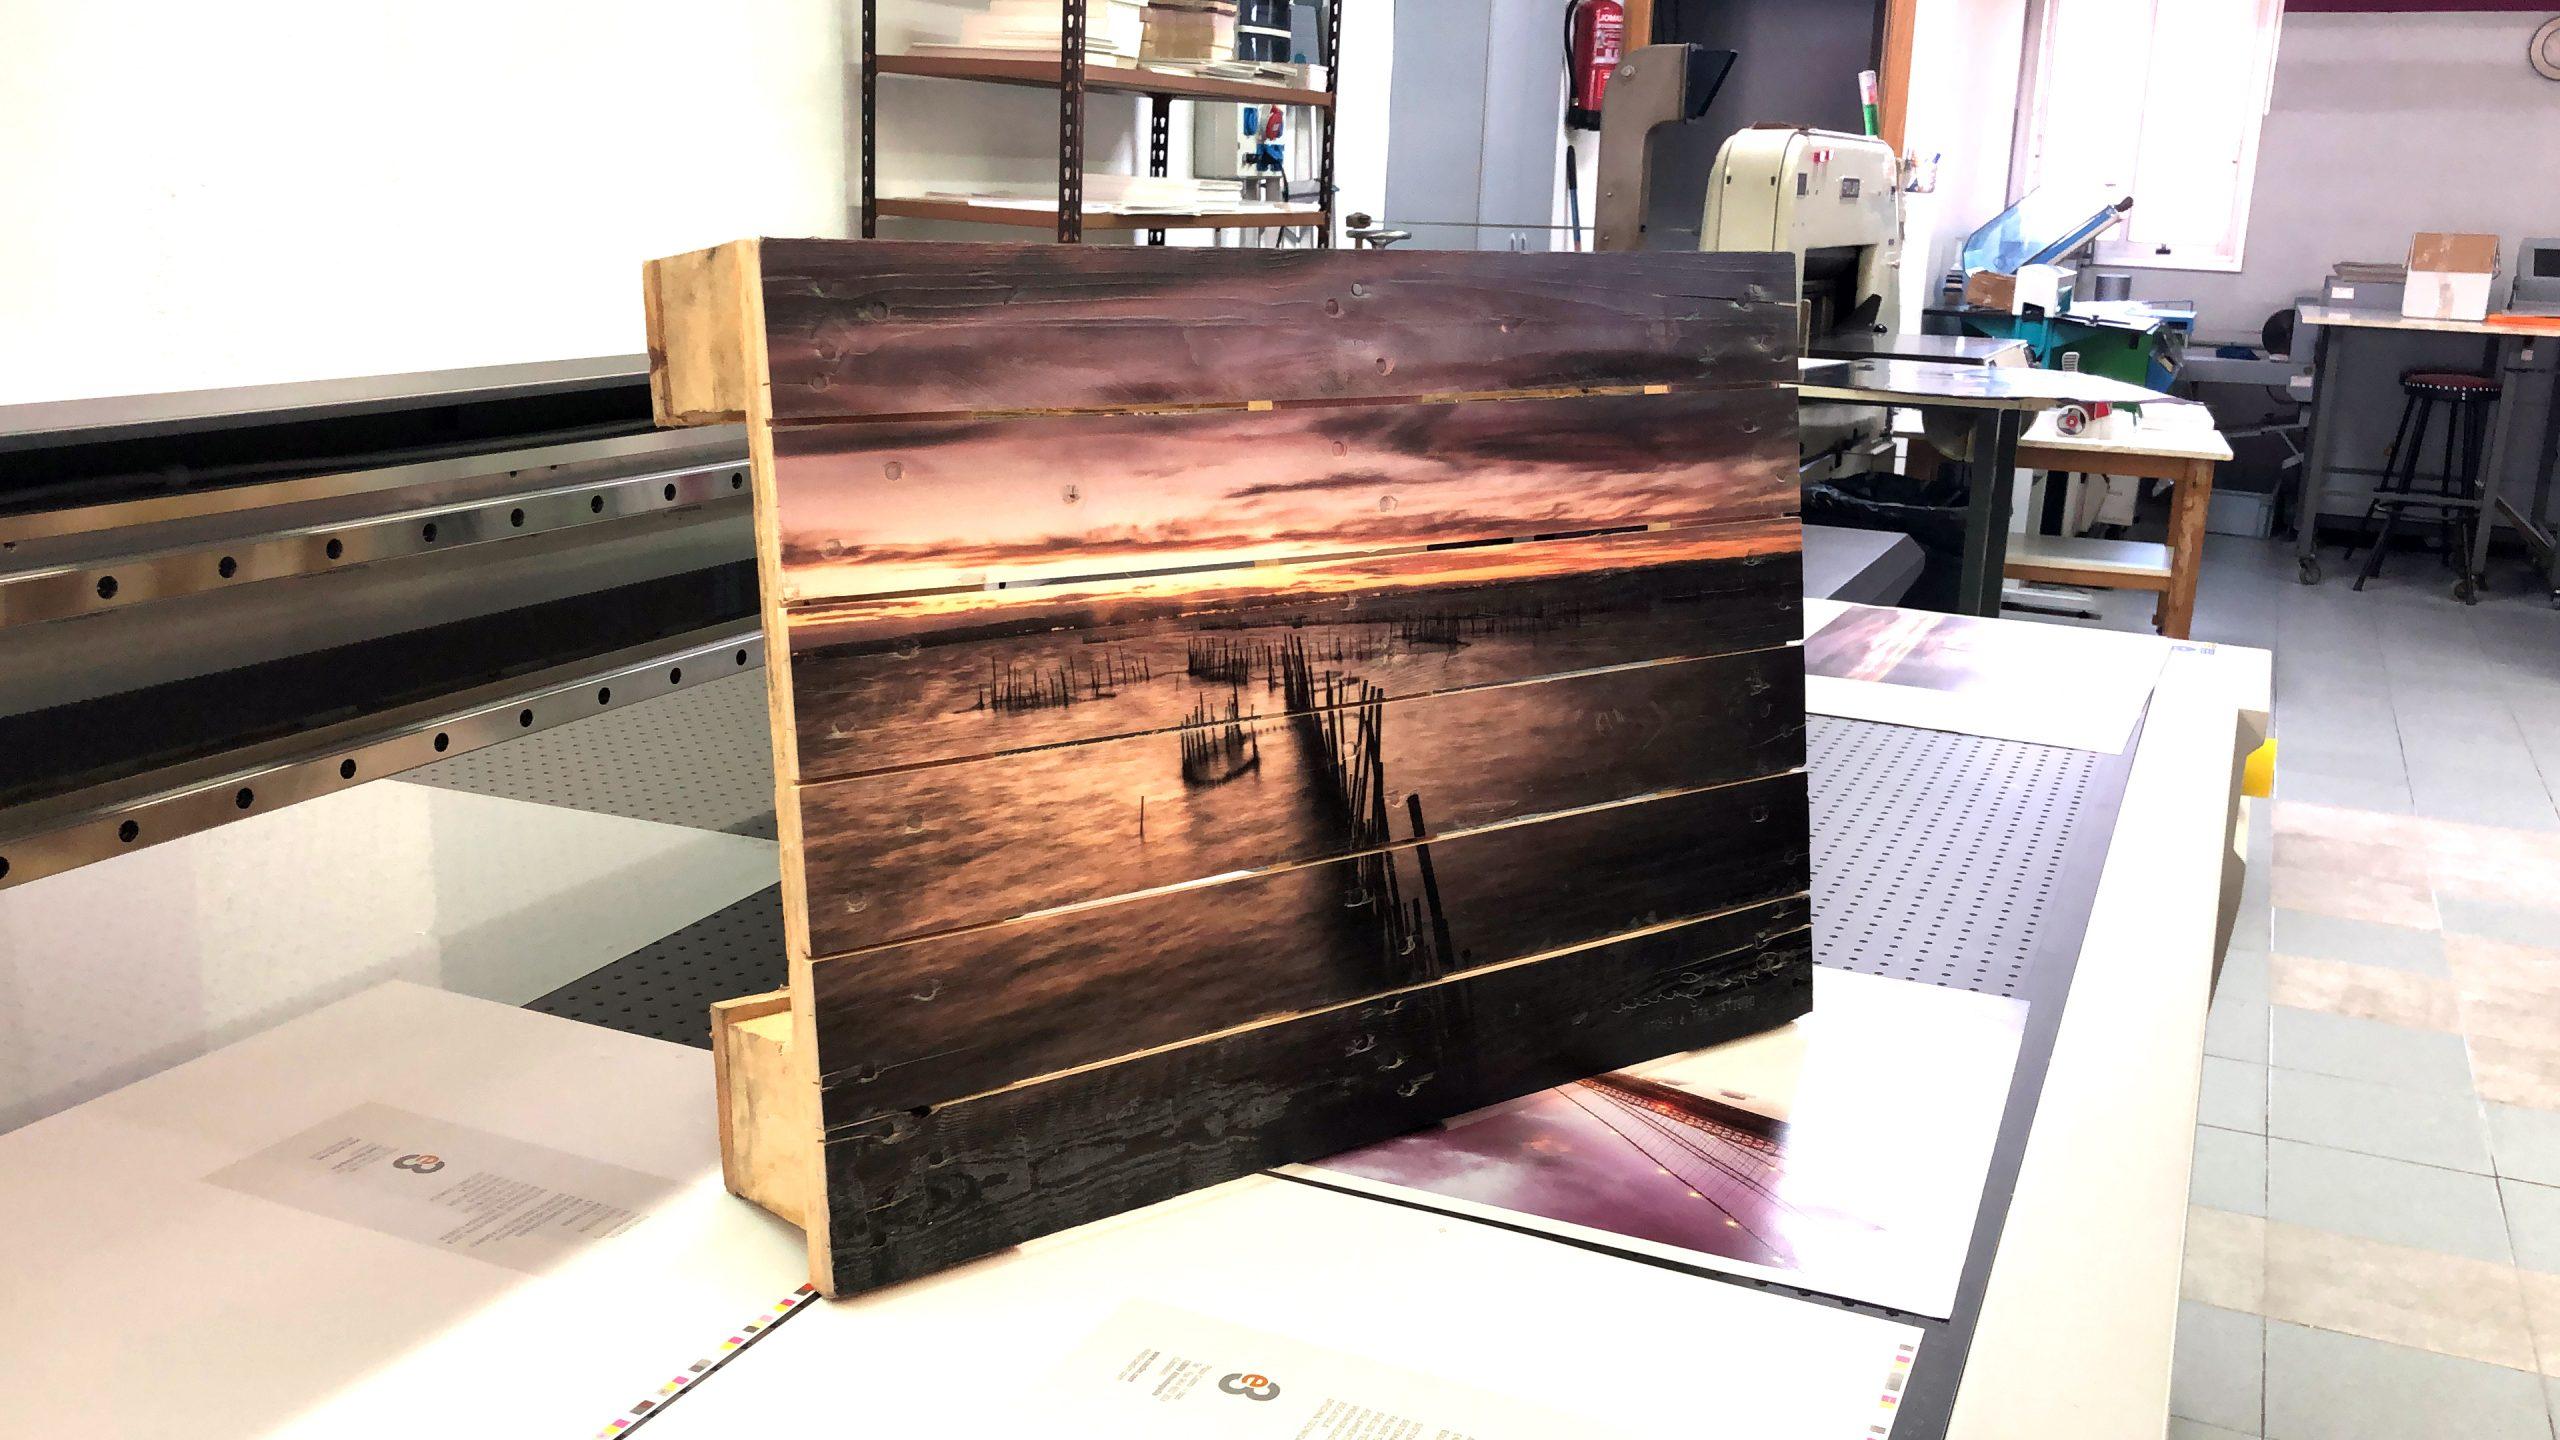 impresión de fotos sobre palets